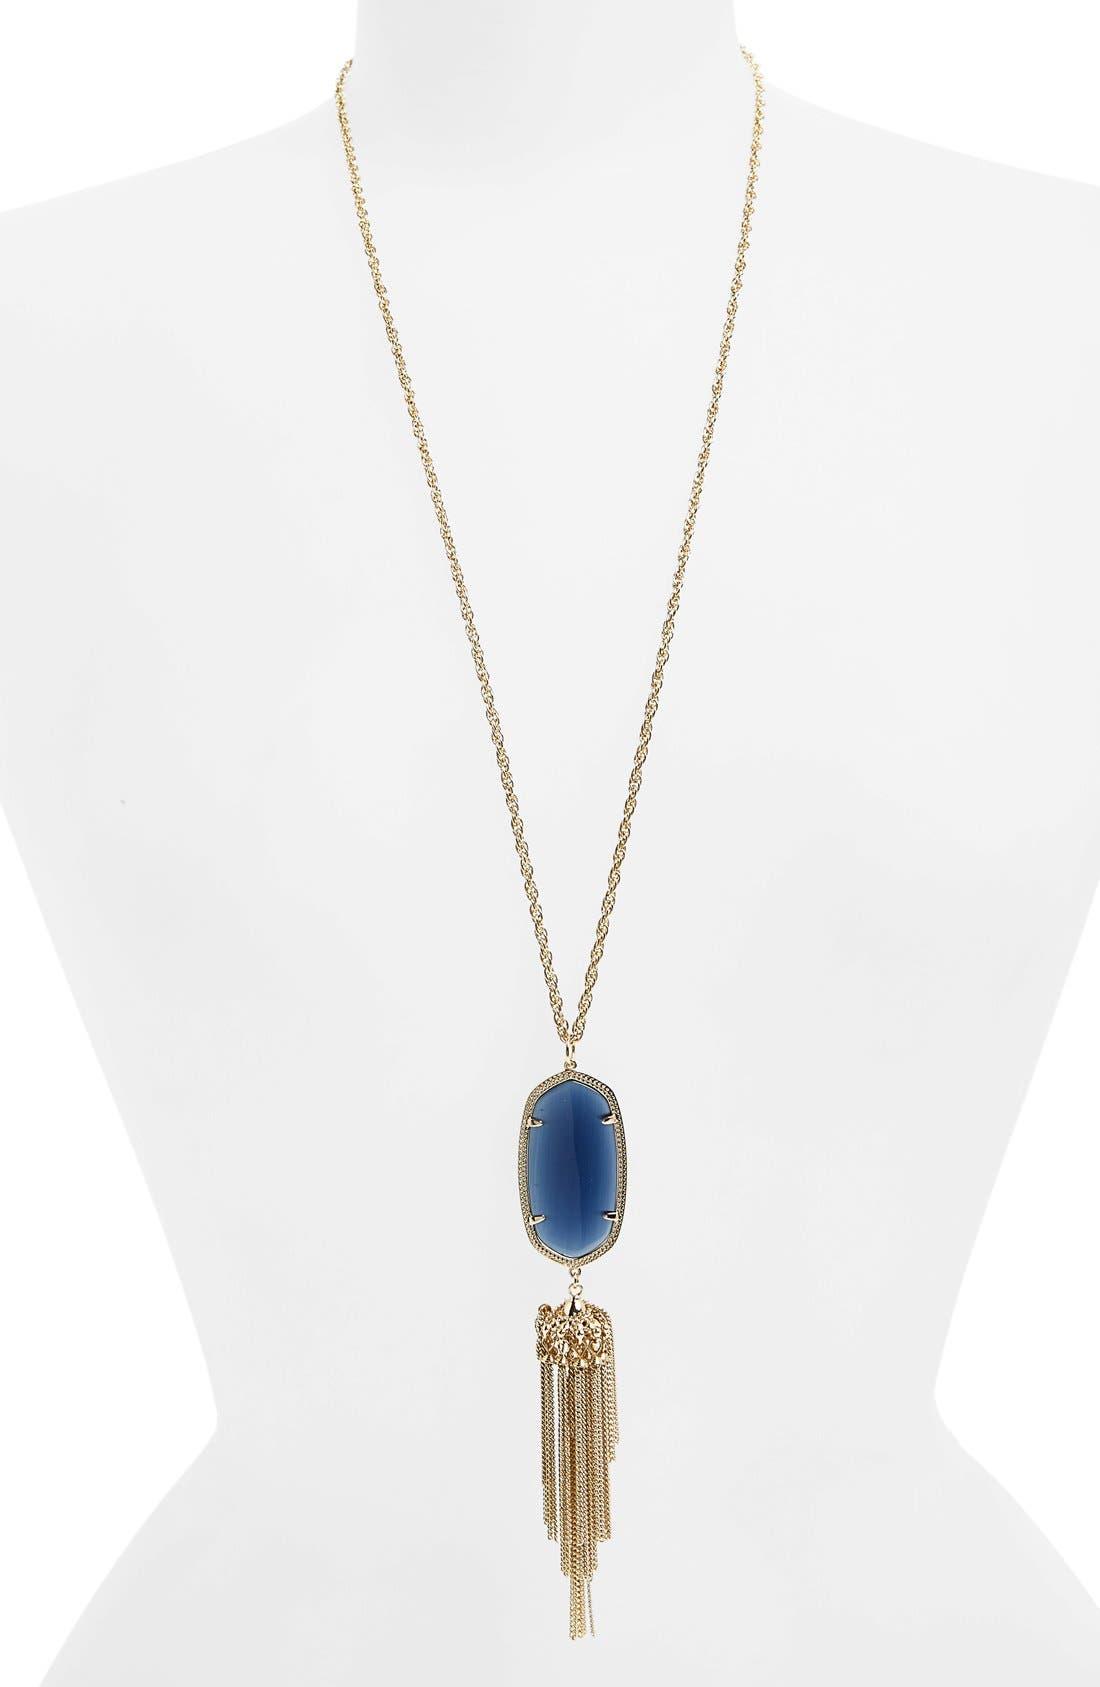 Alternate Image 1 Selected - Kendra Scott 'Rayne' Tassel Pendant Necklace